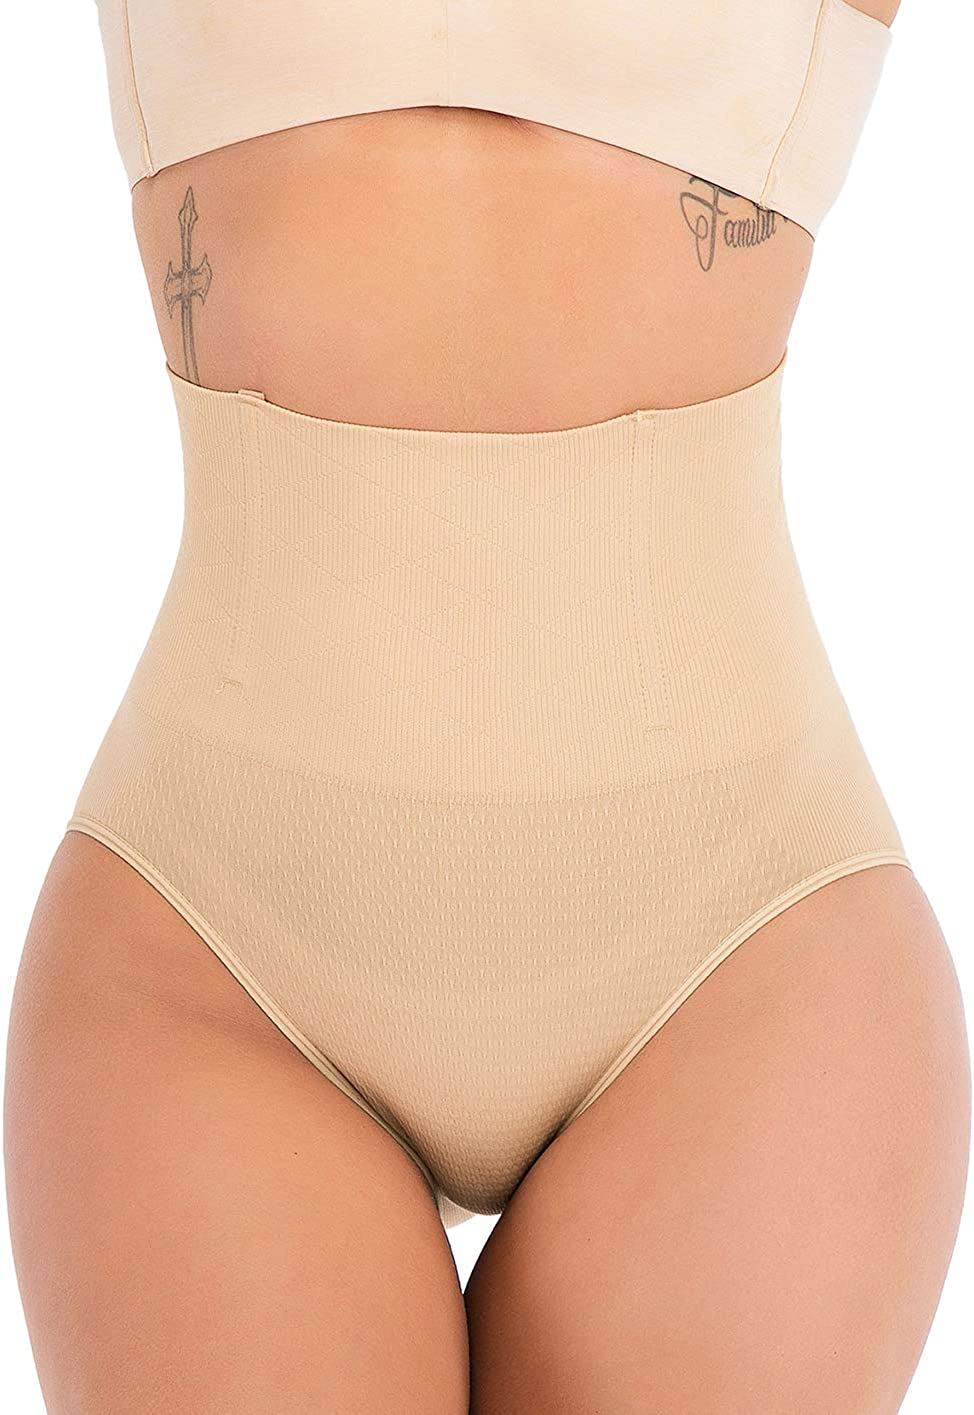 High Waist Shapewear for Women Tummy Control Underwear Body Shaper Waist Cincher Girdle Panties